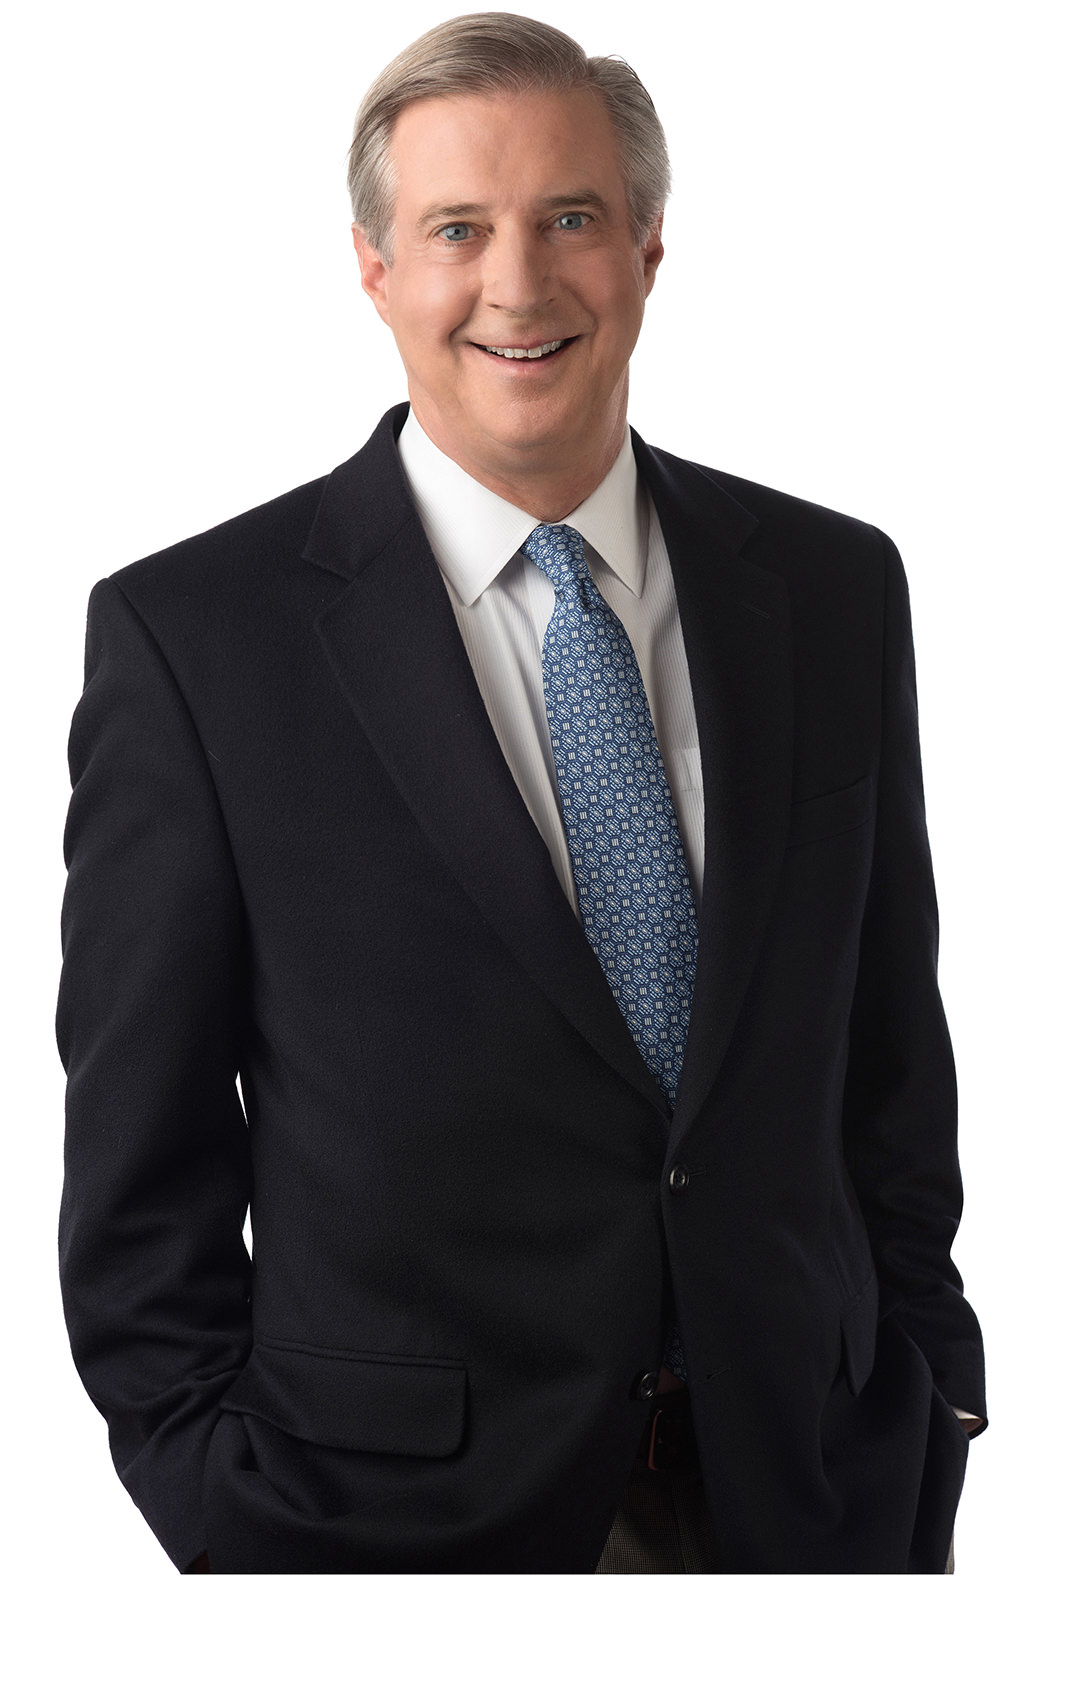 Timothy J. Fitzgibbon